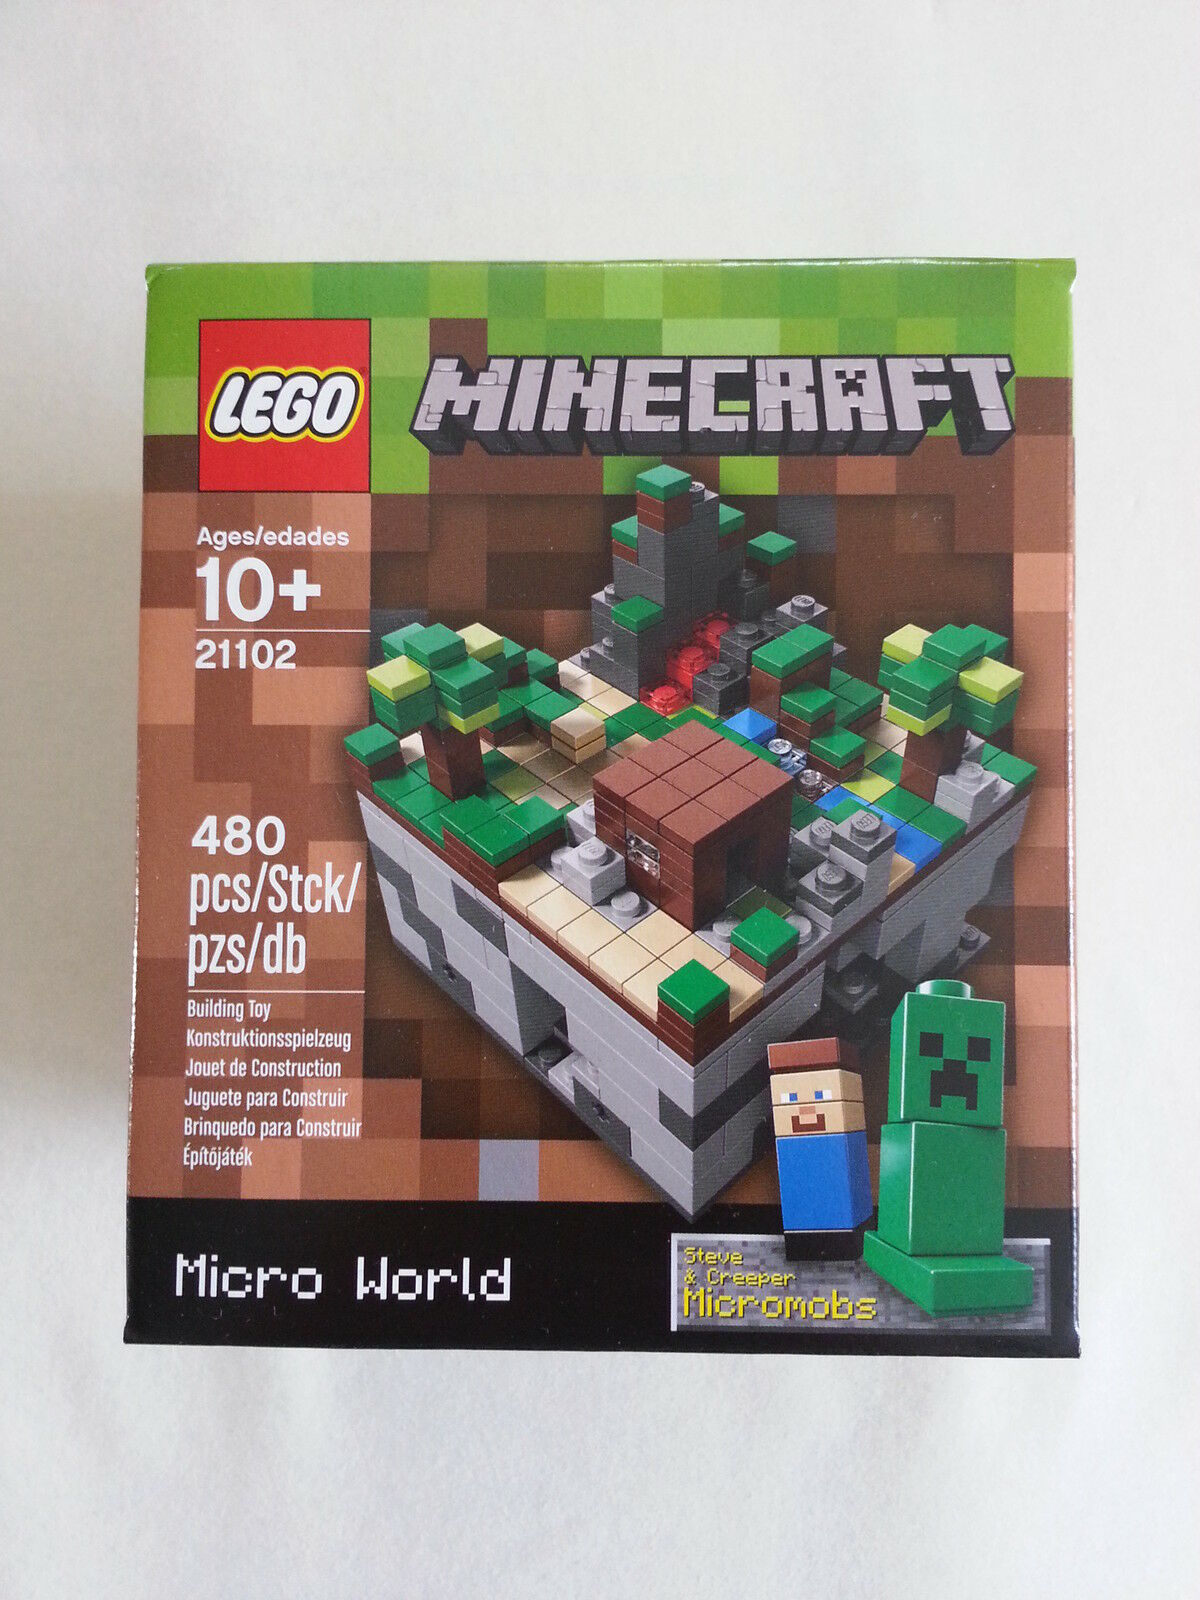 Lego Cuusoo 21102 Minecraft  Micro World Neuf & Emballage D'Origine   Neuf Scellé  mieux acheter